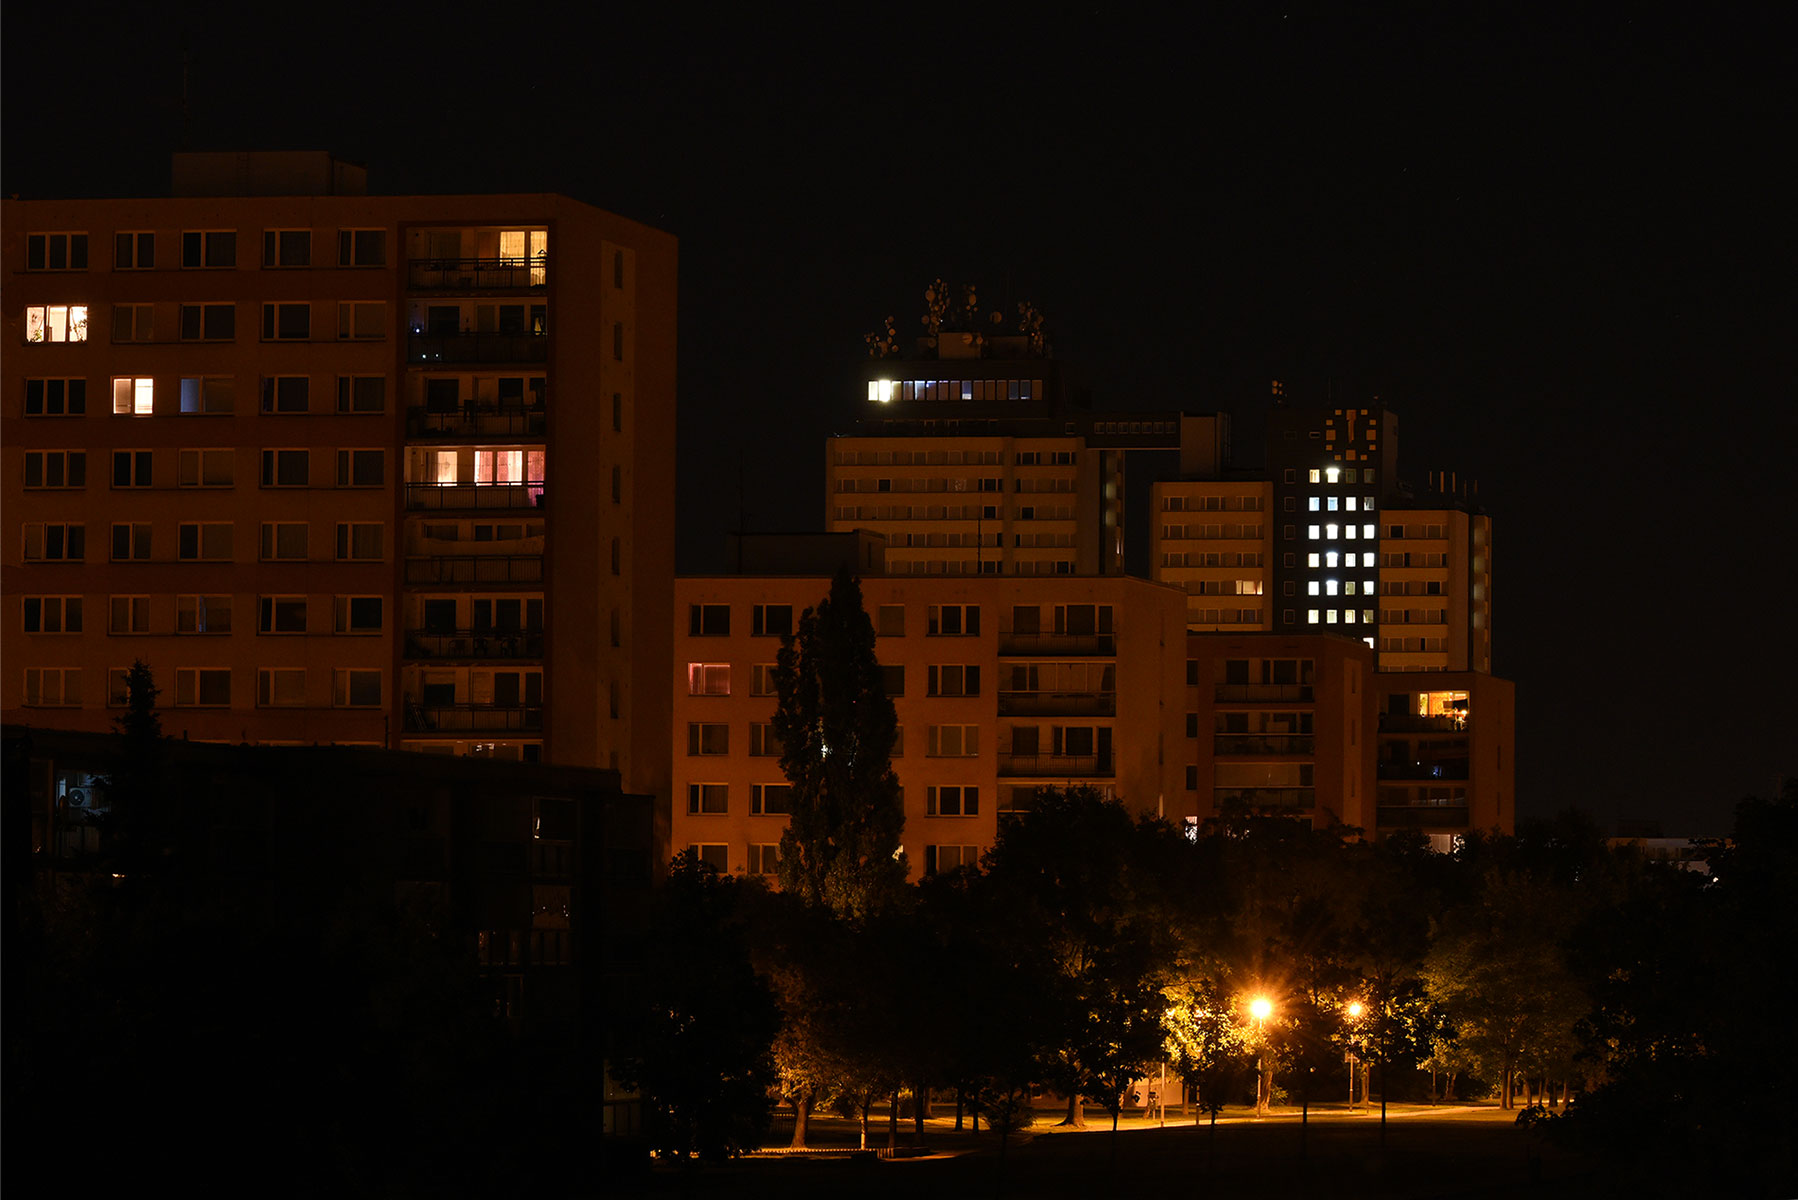 Půlnoc